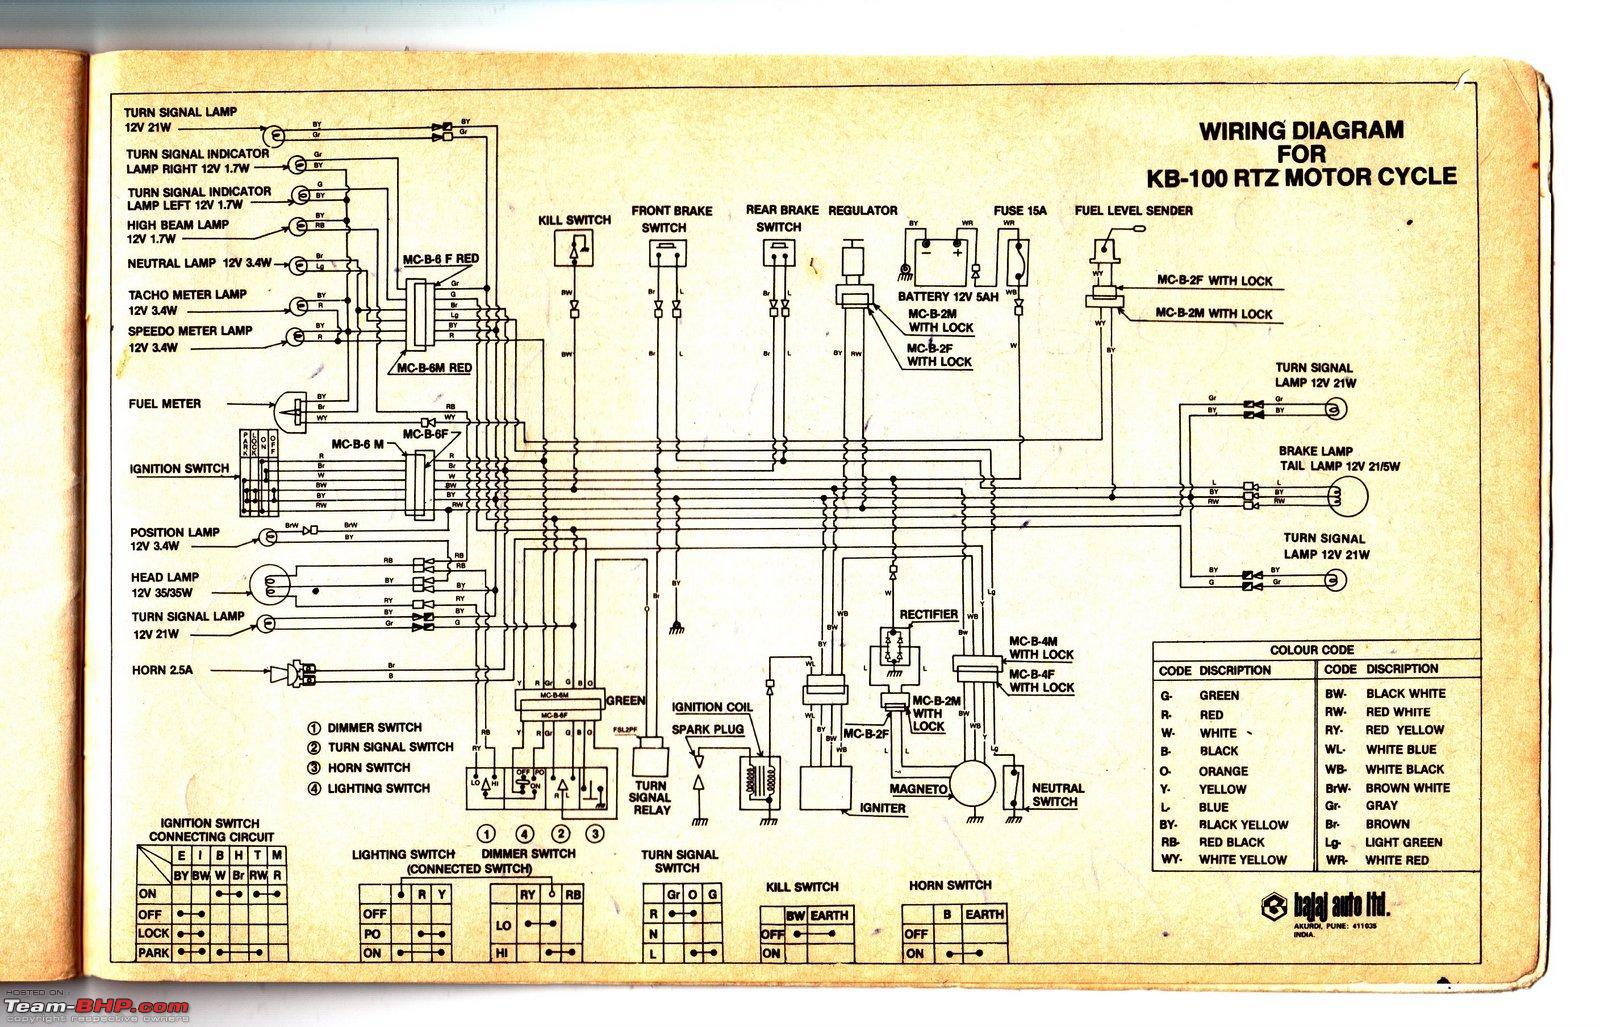 Miraculous Wiring Diagrams Of Indian Two Wheelers Team Bhp Wiring Cloud Timewinrebemohammedshrineorg